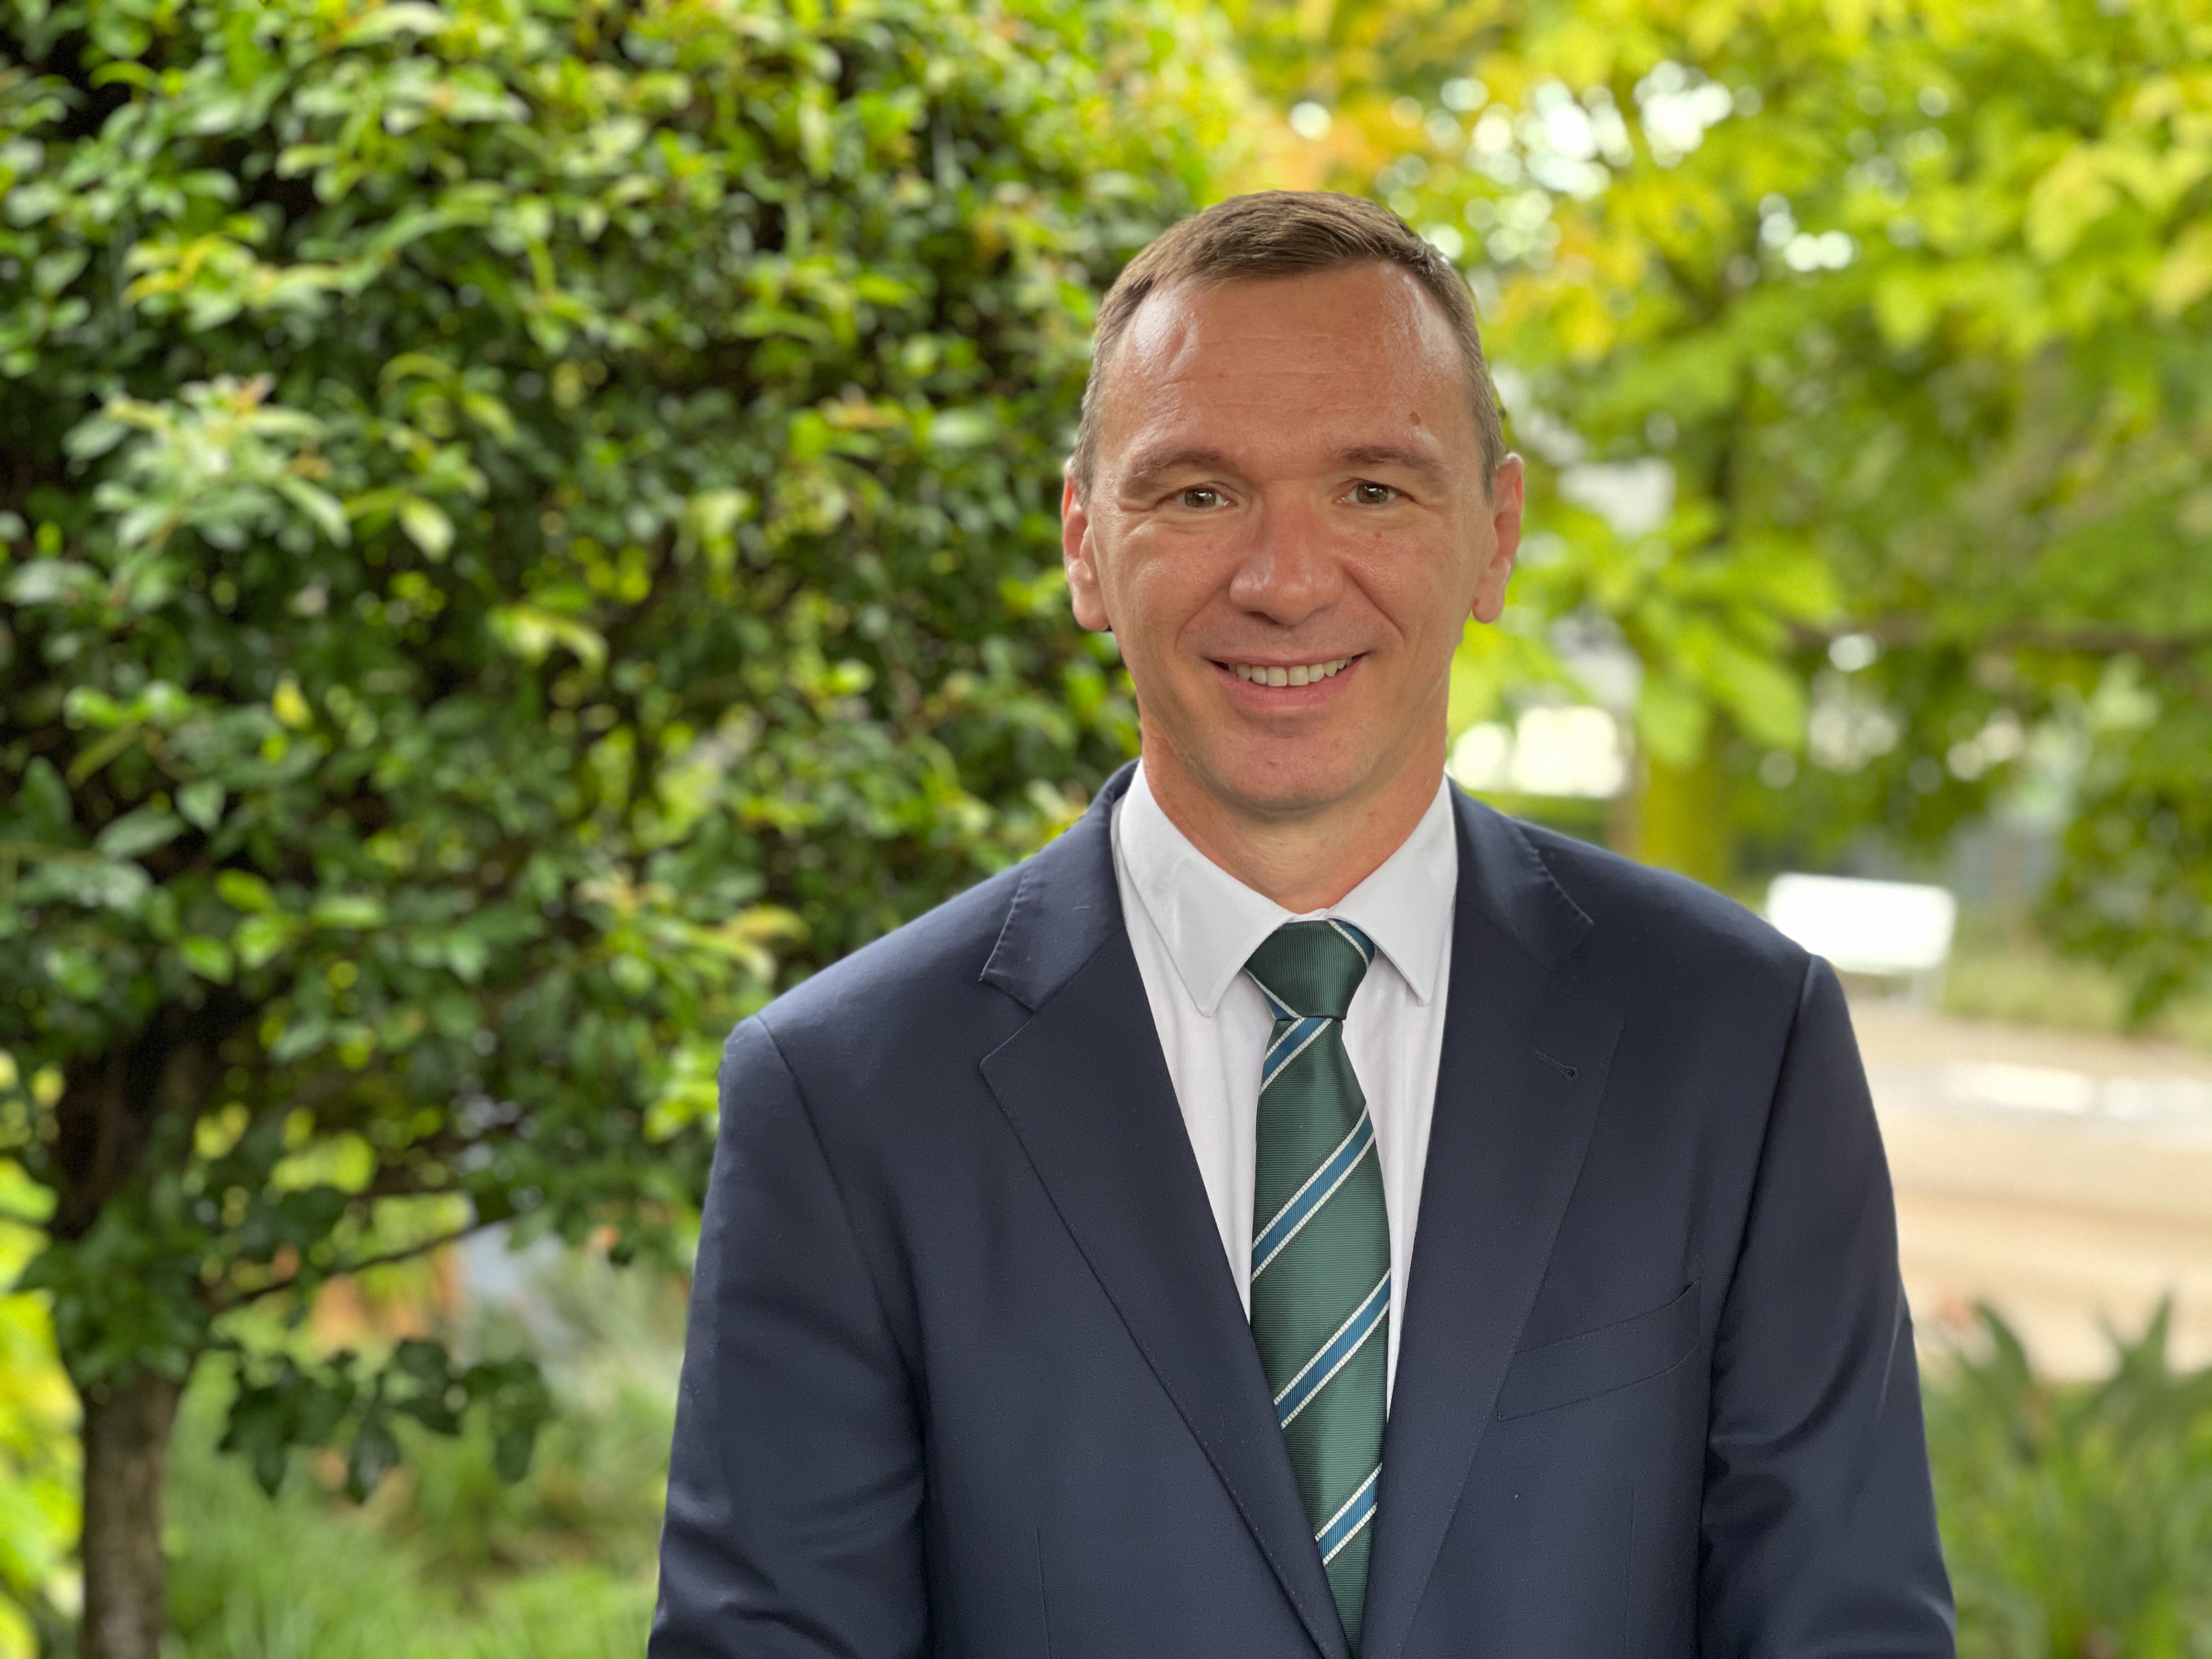 Mr Michael Bos | Director of International